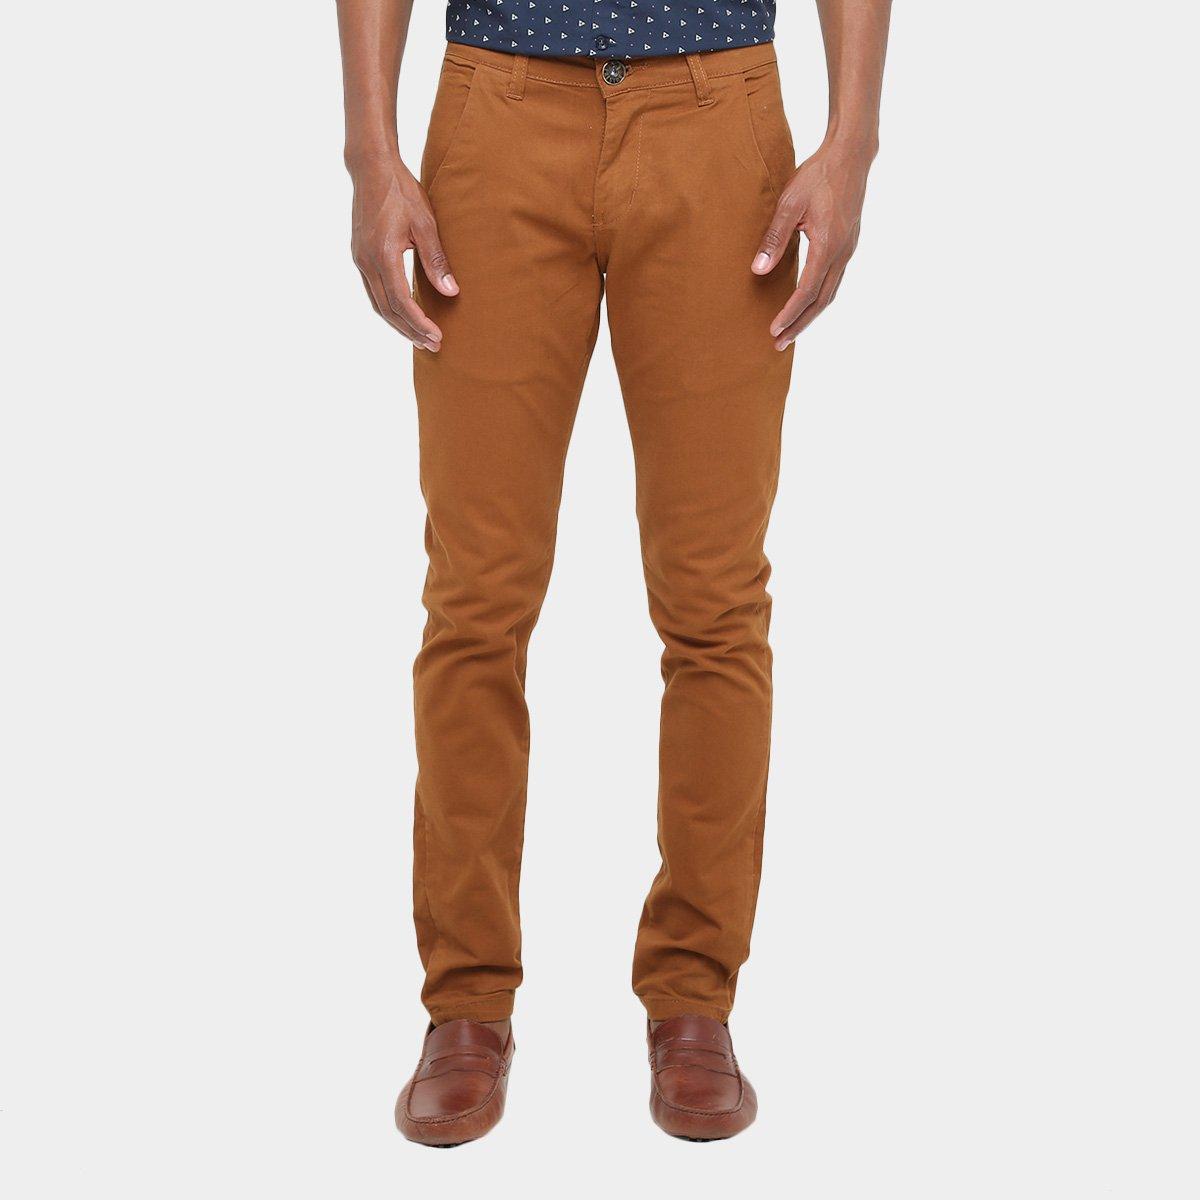 Calça Skinny Preston Color Bolso Faca Masculina - Caramelo - Compre Agora  e9c02ea215d